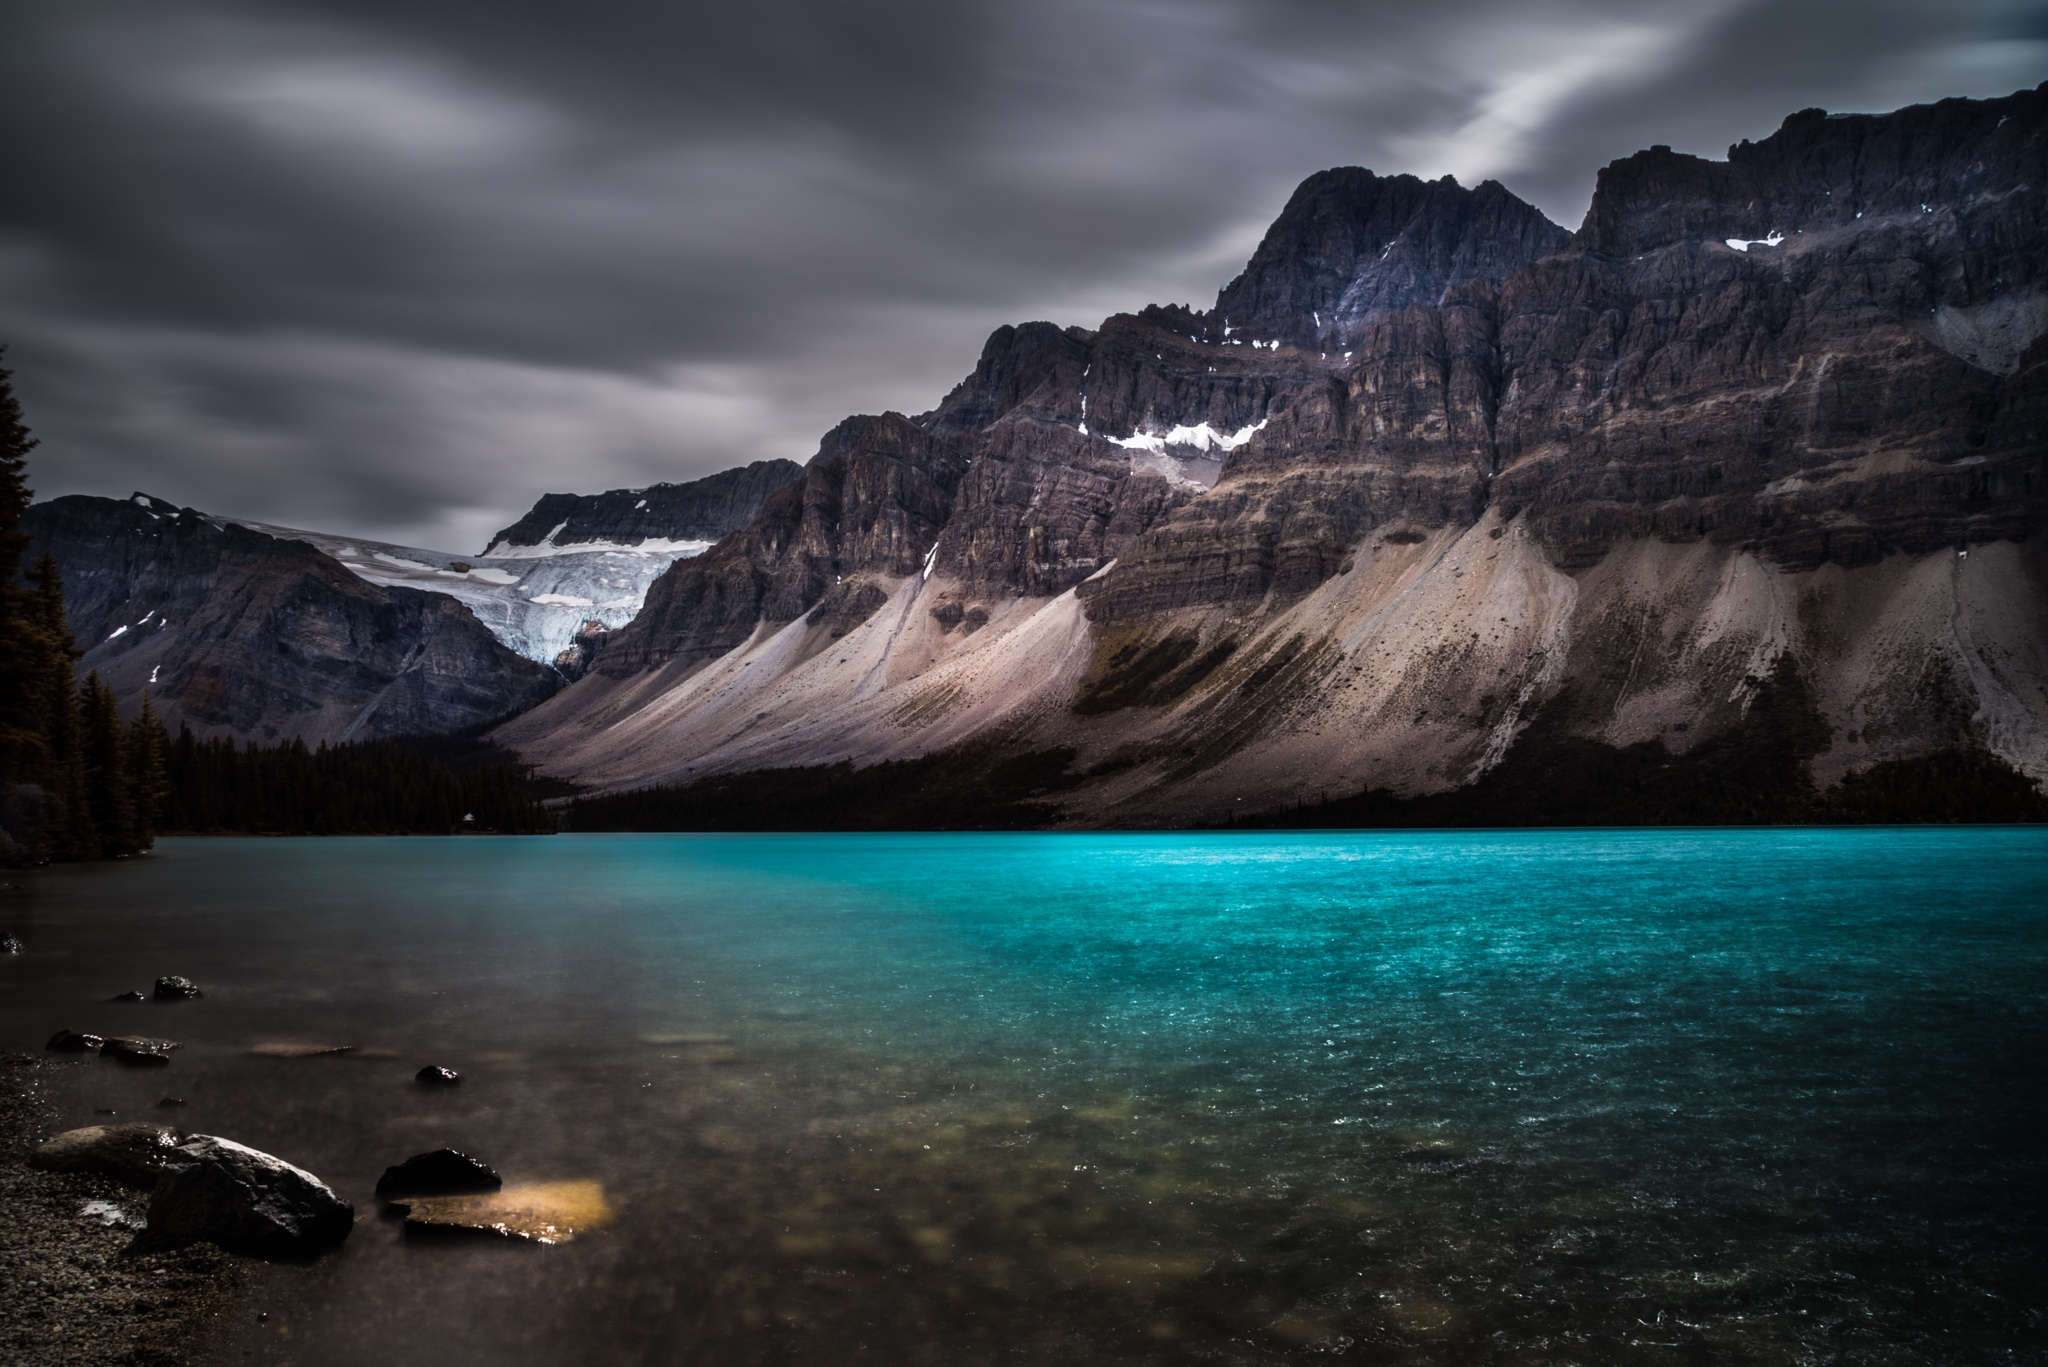 Bluey Mountain Clouds by jessemartineau